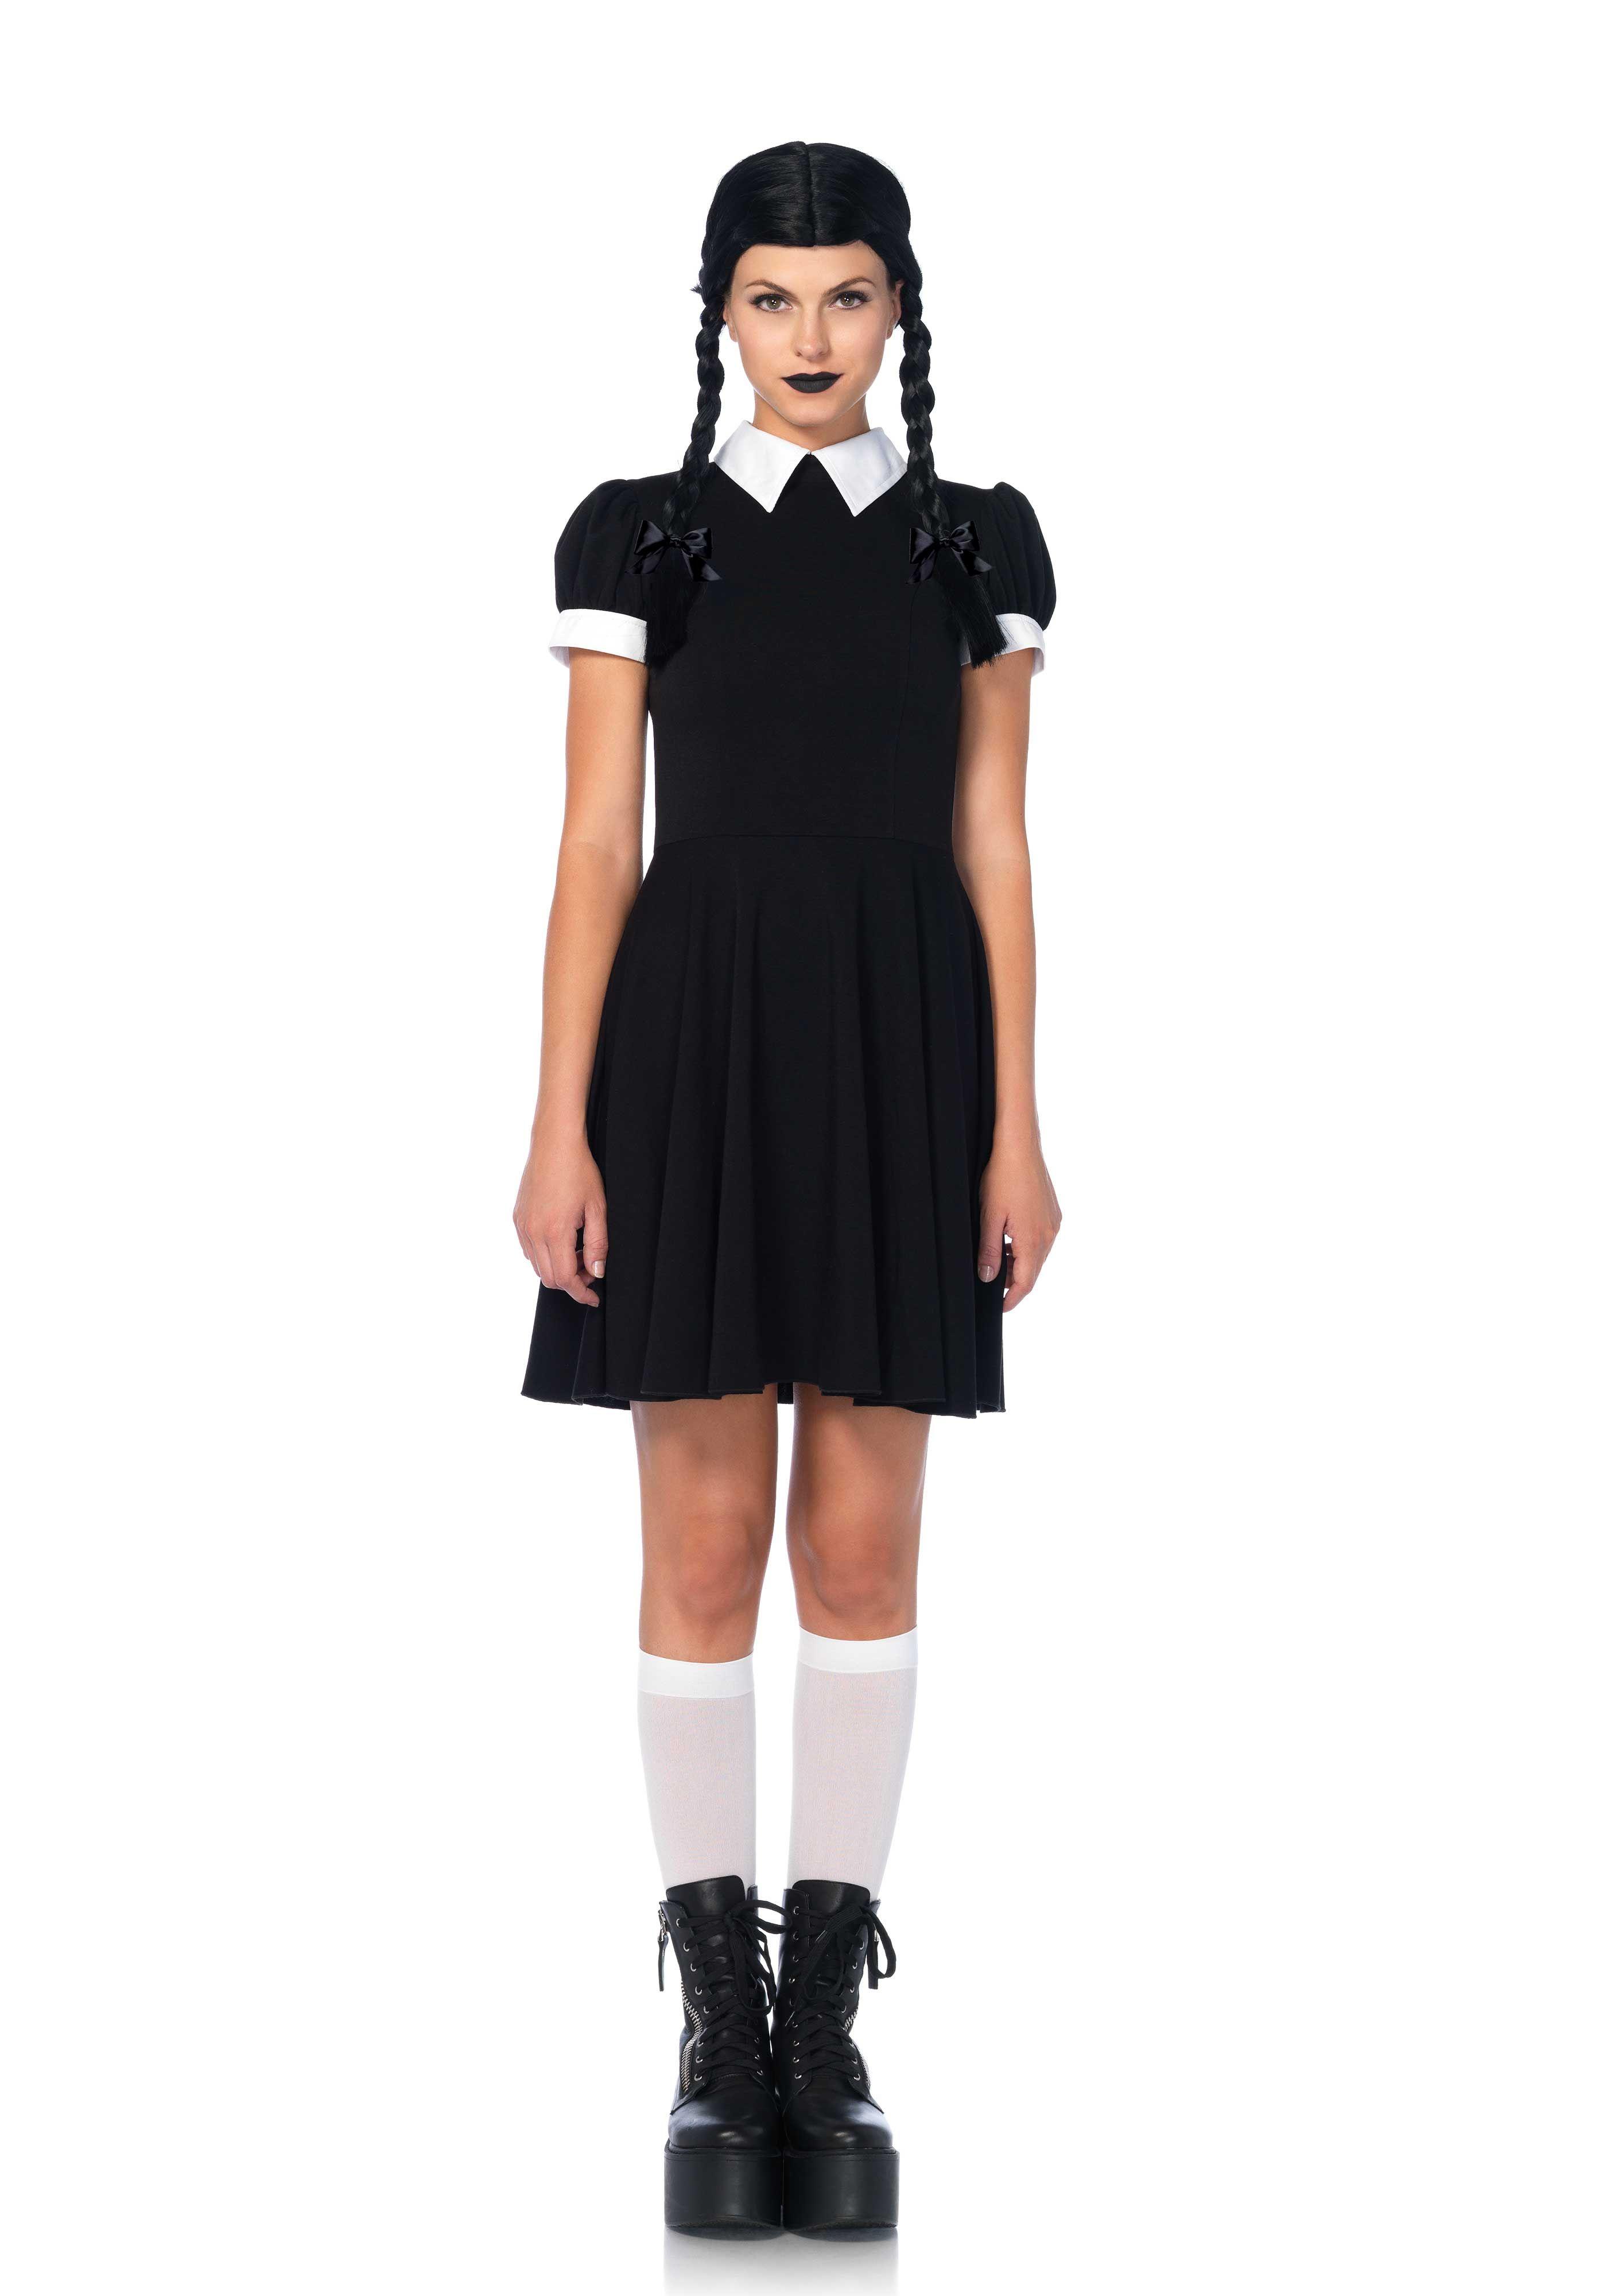 Leg Avenue Gothic Darling Costume Wednesday Addams